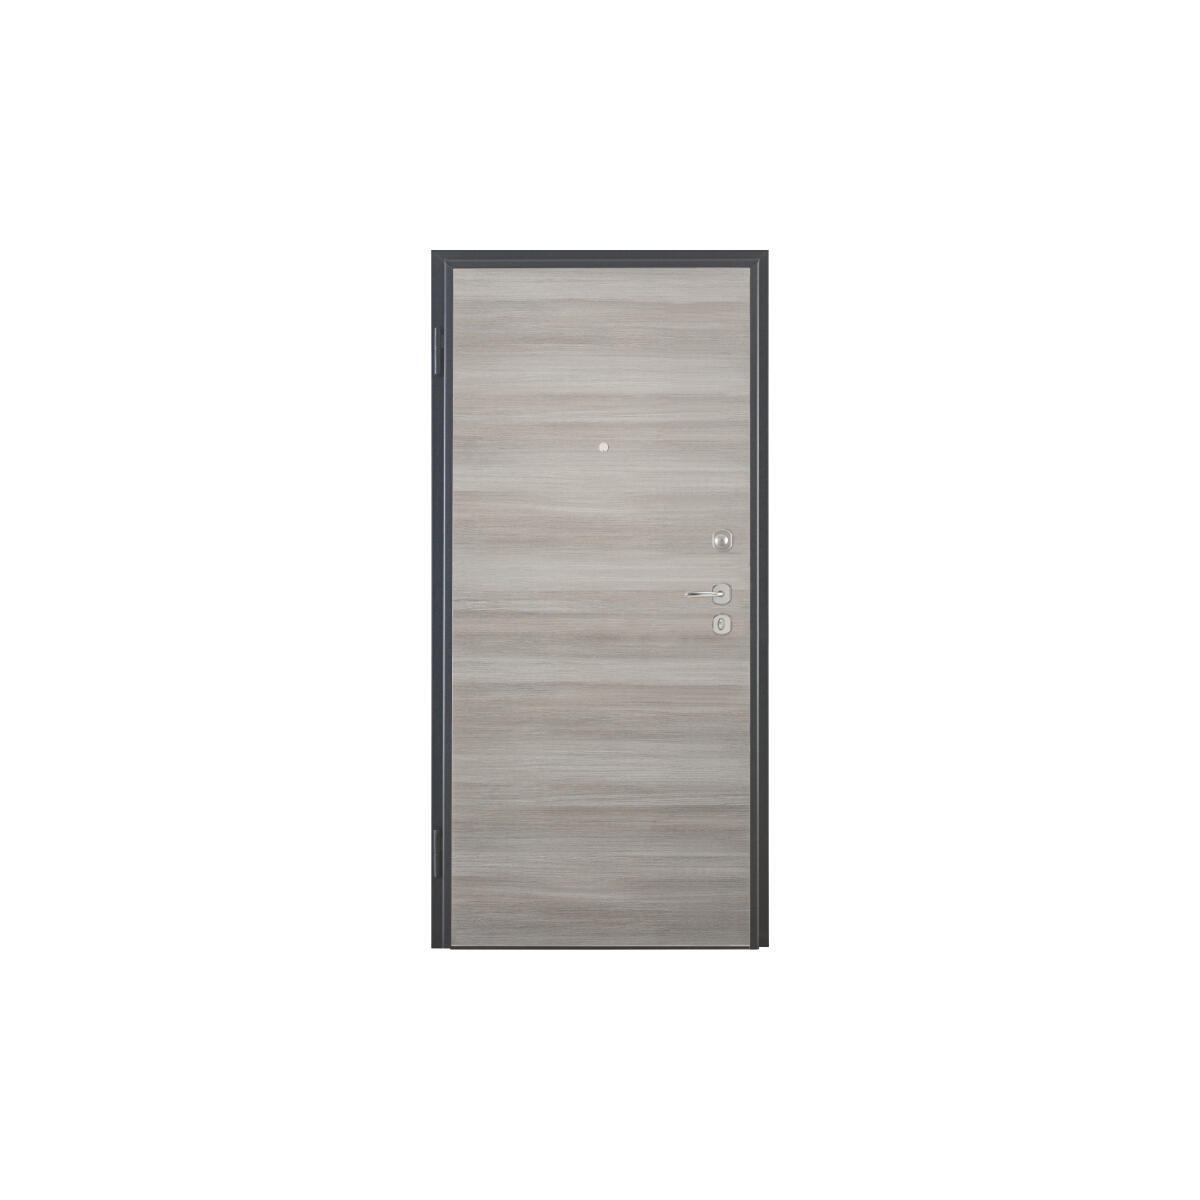 Porta blindata Blocked marrone L 90 x H 210 cm destra - 3